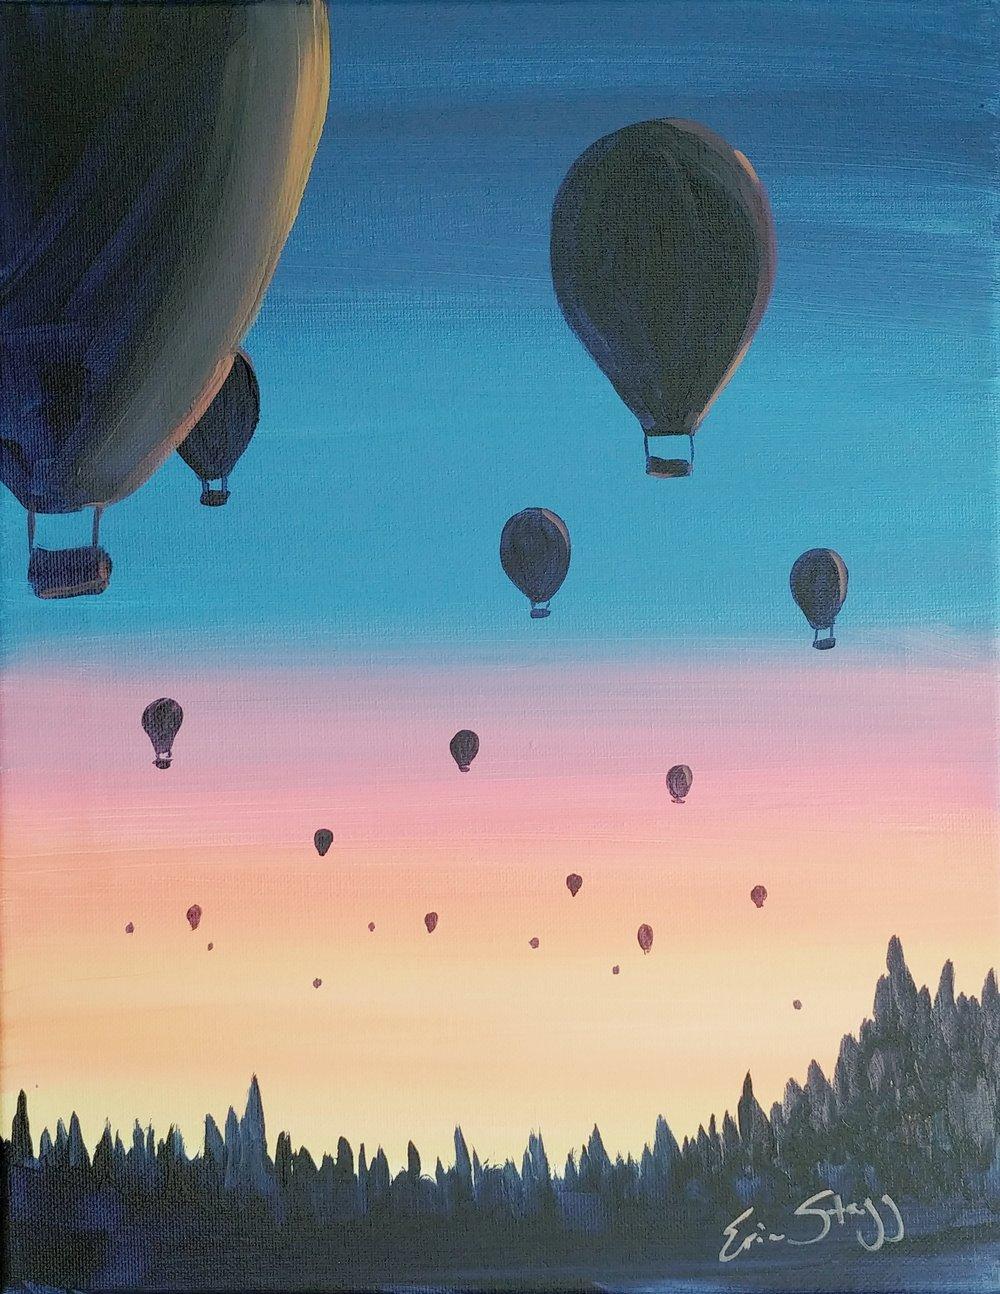 Hot Air Balloons - quick design